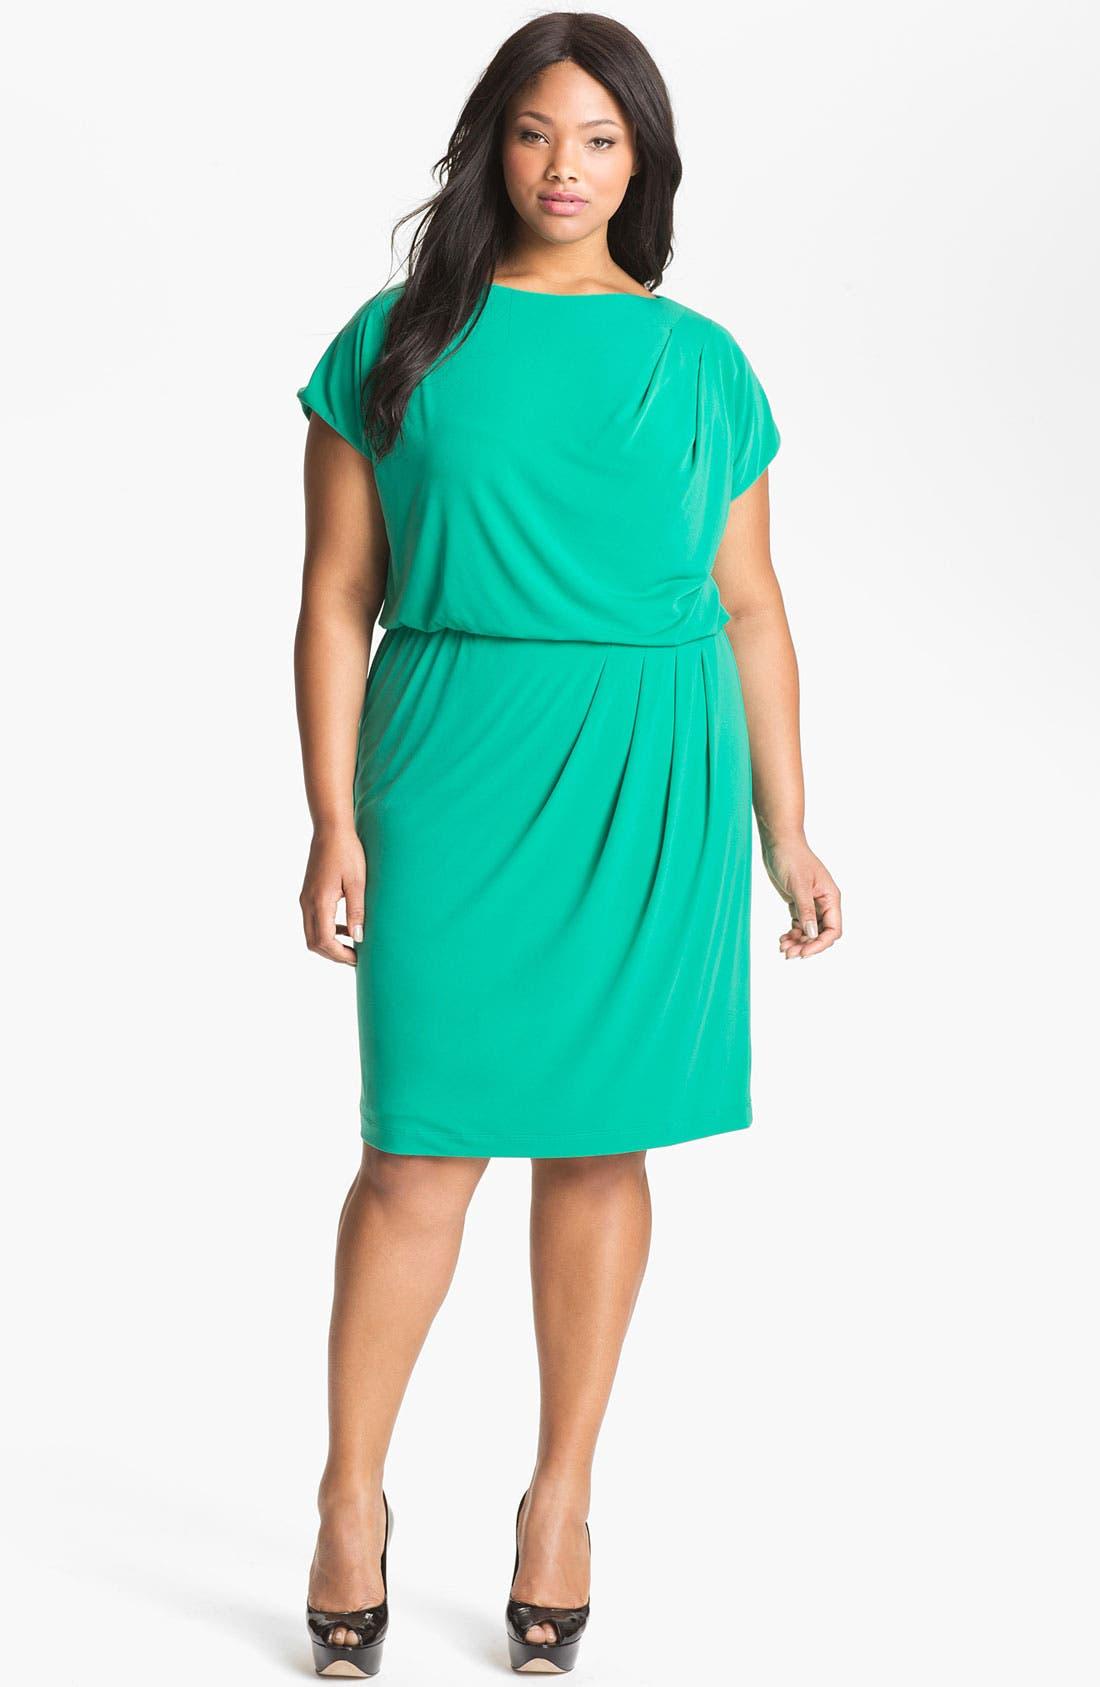 Alternate Image 1 Selected - Vince Camuto Pleated Blouson Dress (Plus Size)